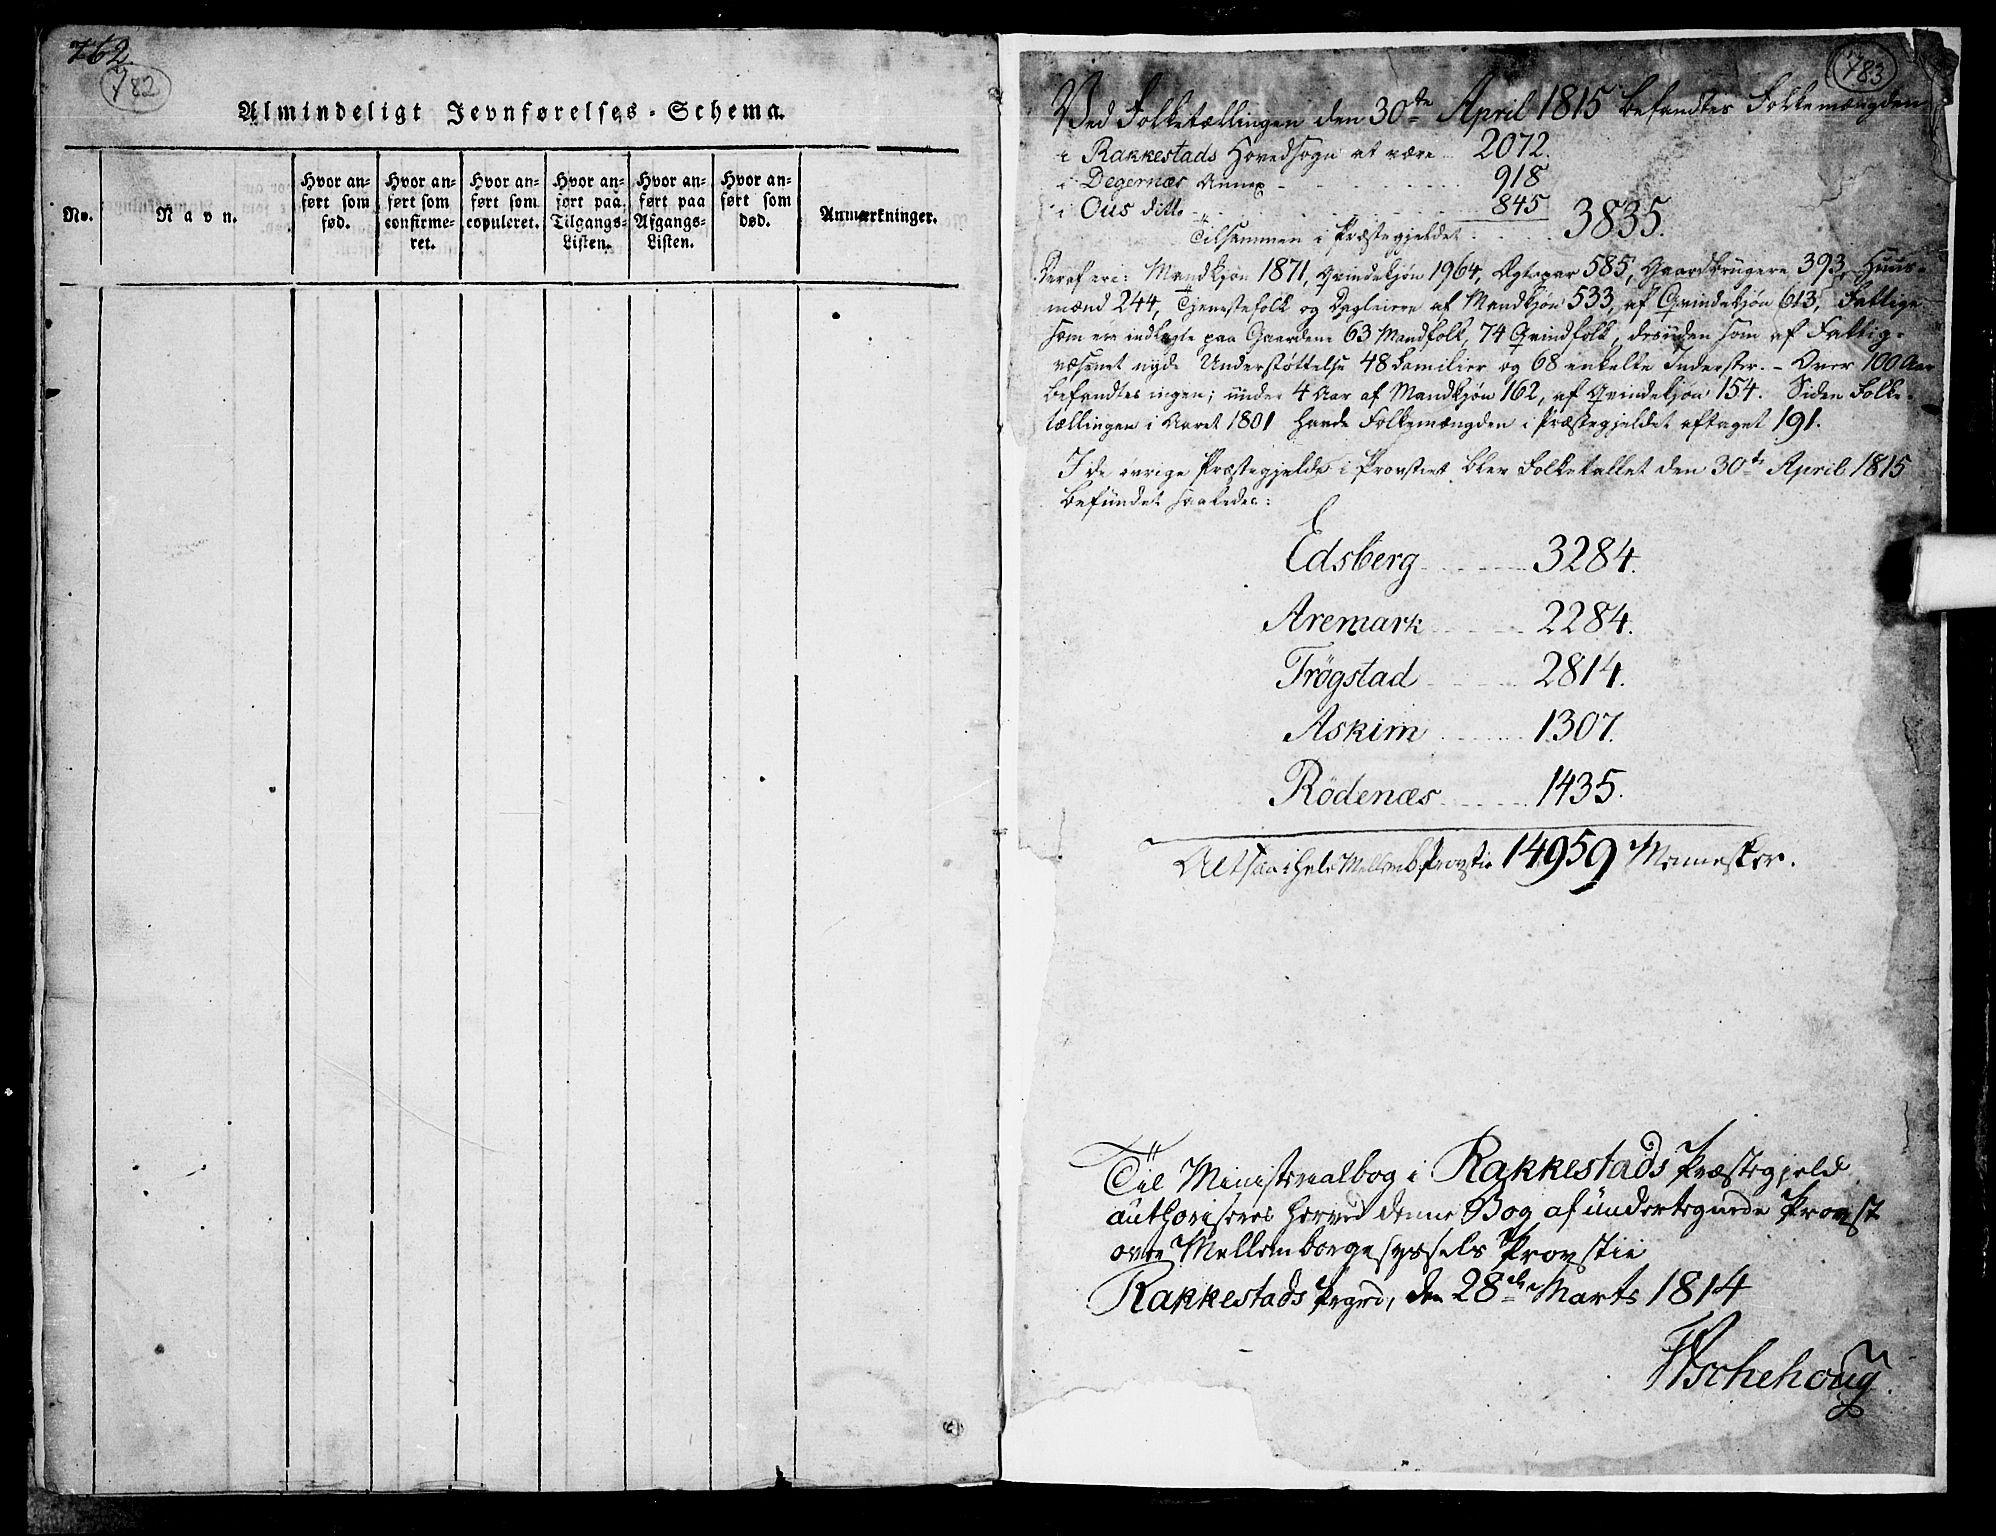 SAO, Rakkestad prestekontor Kirkebøker, F/Fa/L0006: Ministerialbok nr. I 6, 1814-1824, s. 782-783